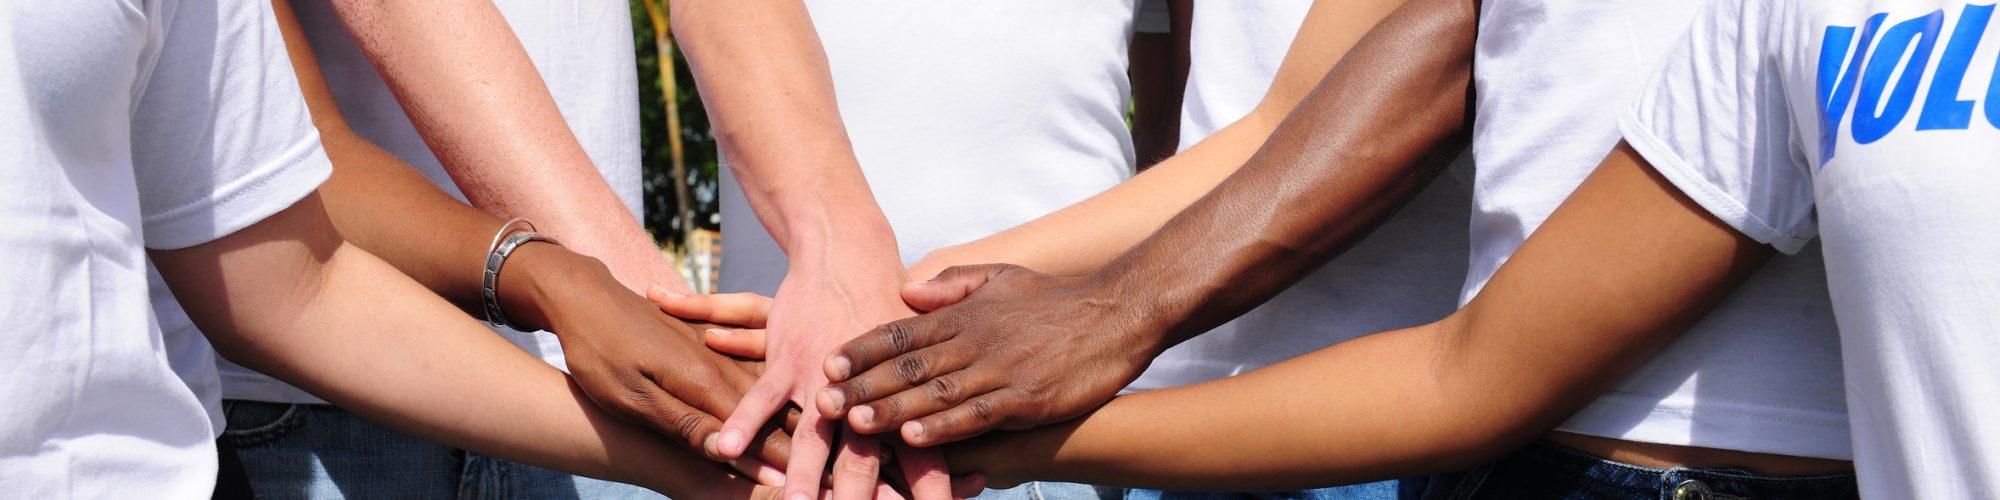 multi-ethnic volunteer group hands together showing unity